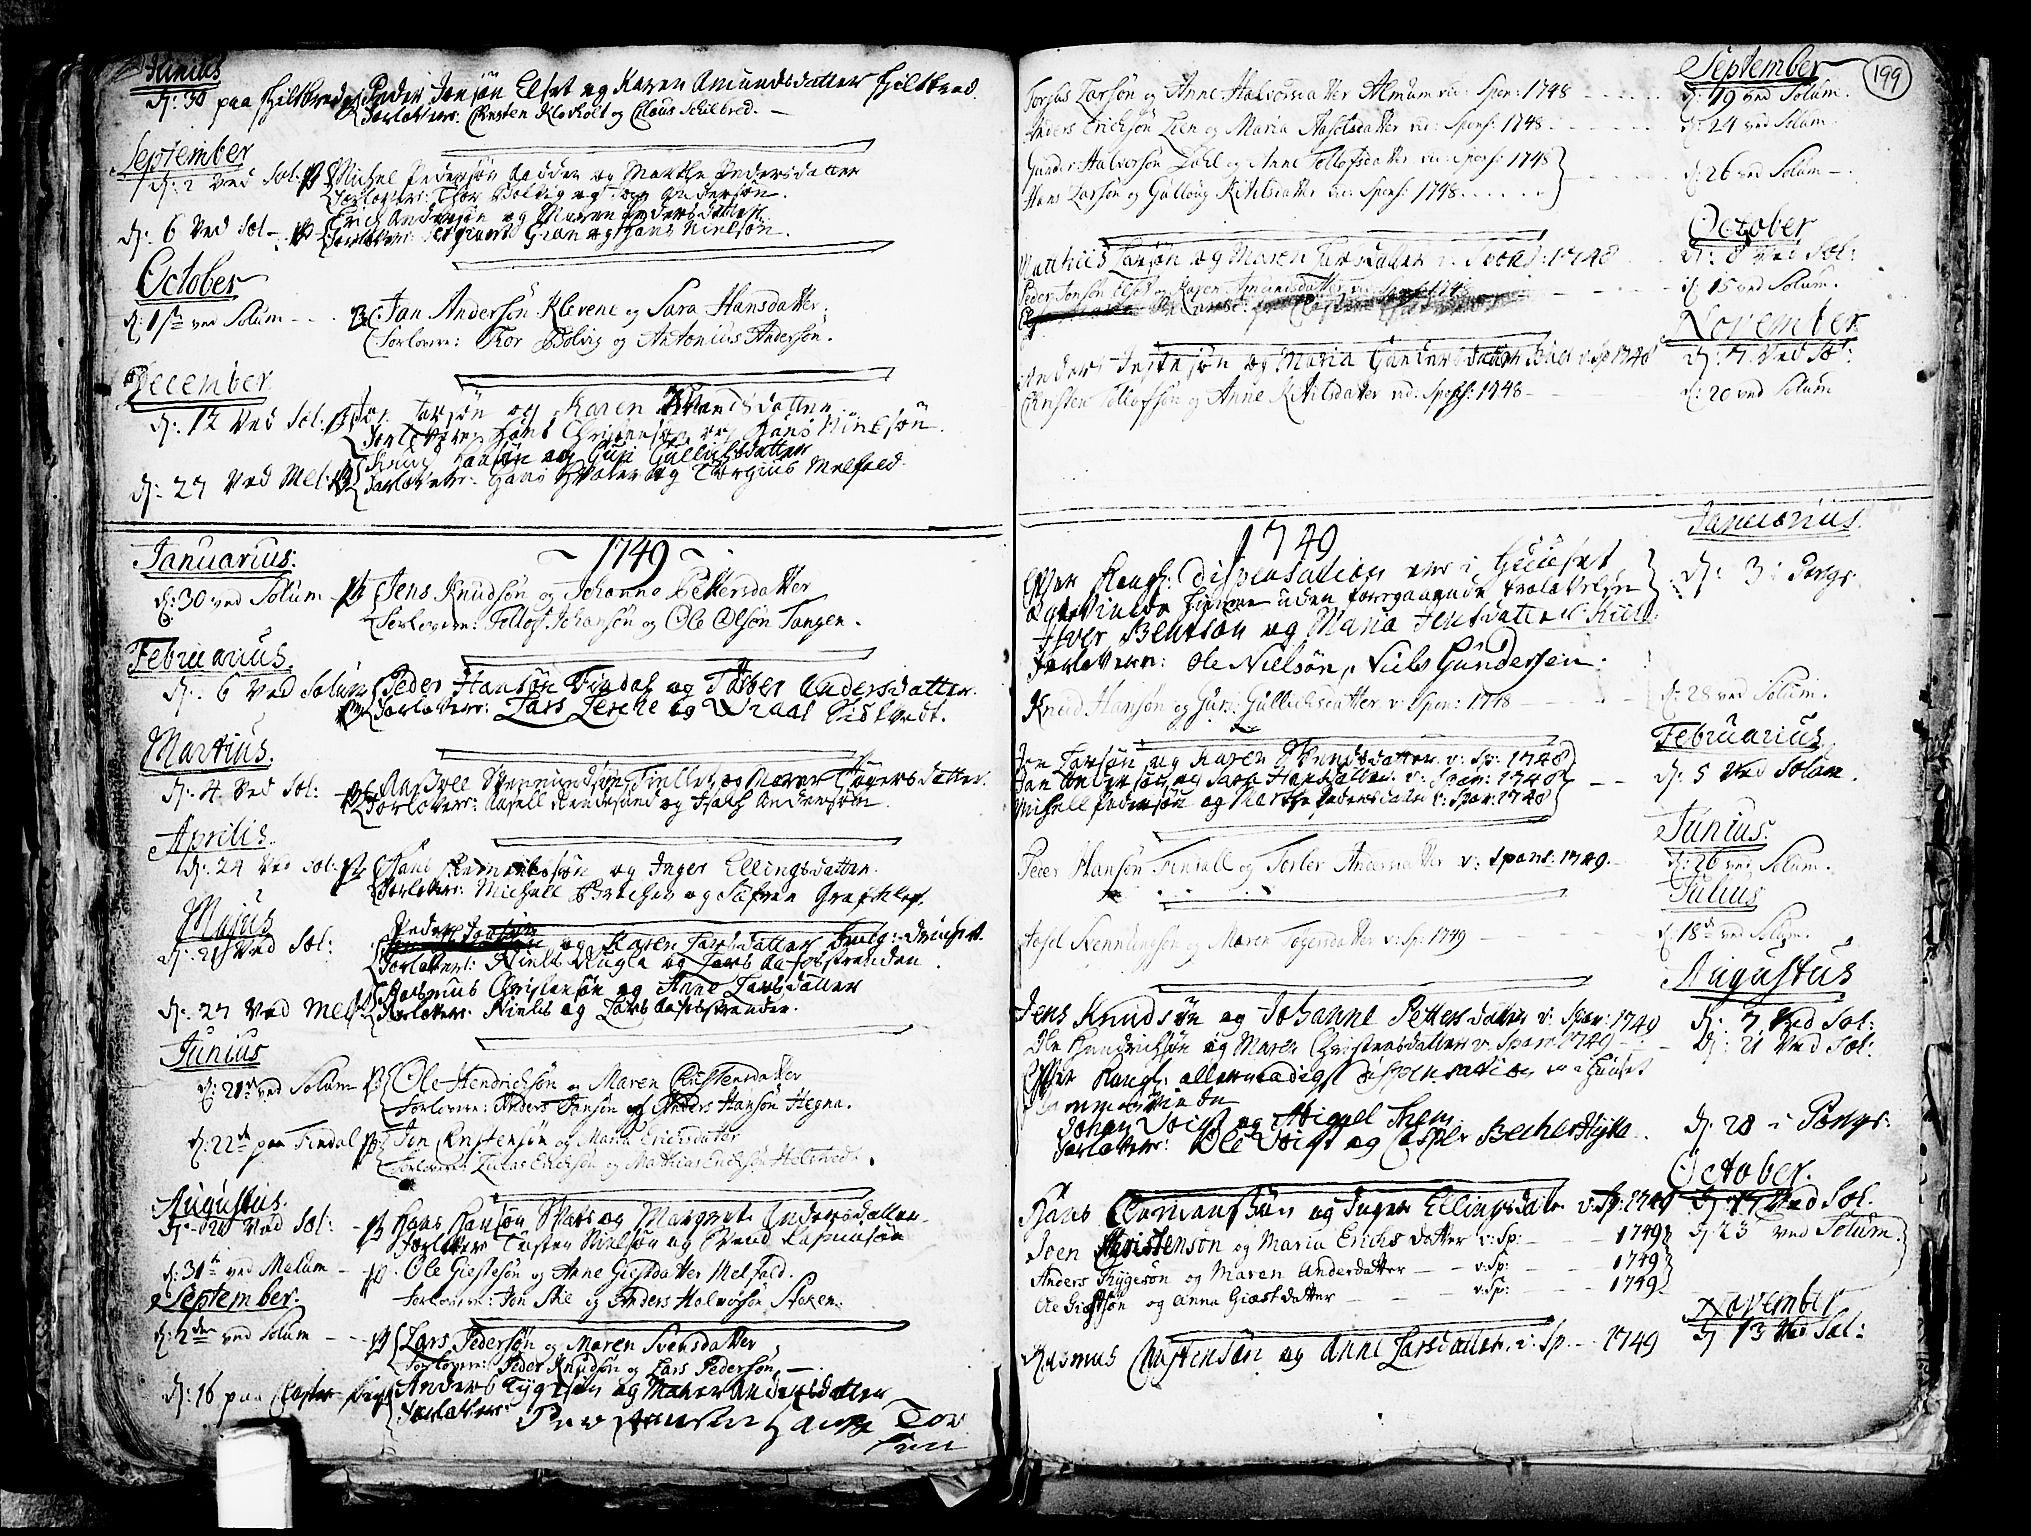 SAKO, Solum kirkebøker, F/Fa/L0002: Ministerialbok nr. I 2, 1713-1761, s. 199